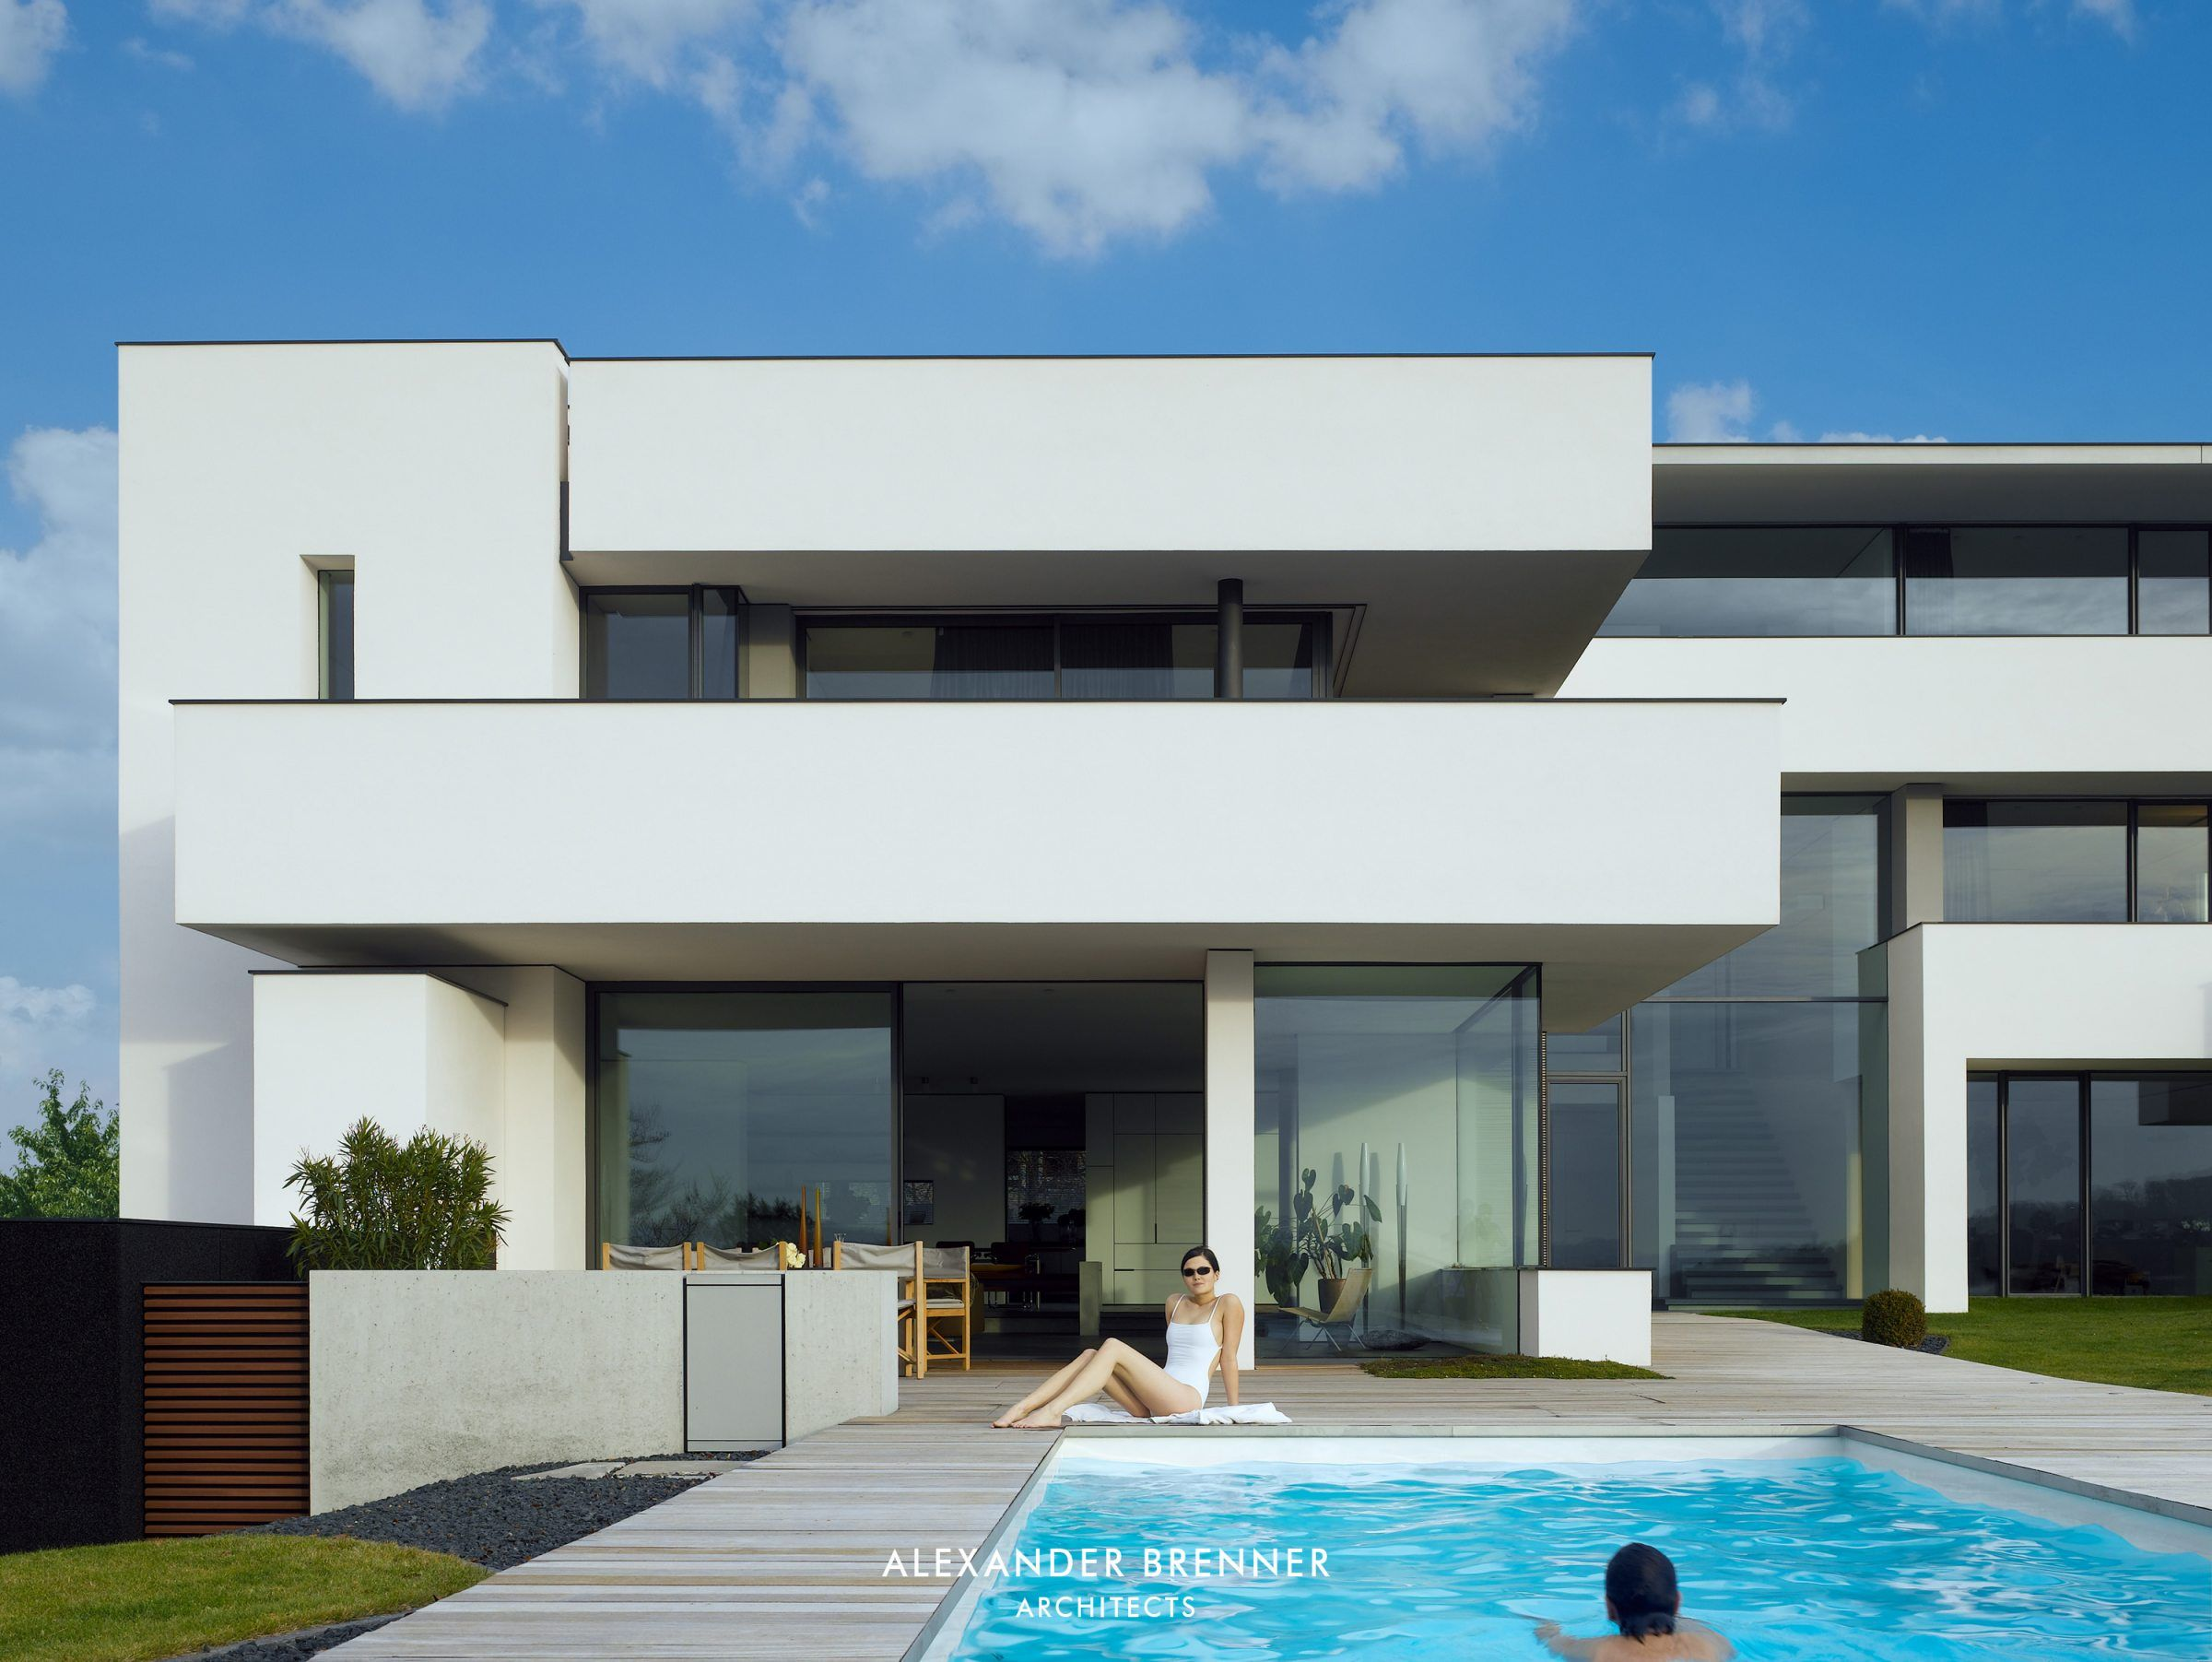 Am Oberen Berg - Alexander Brenner Architects | Architecture ...